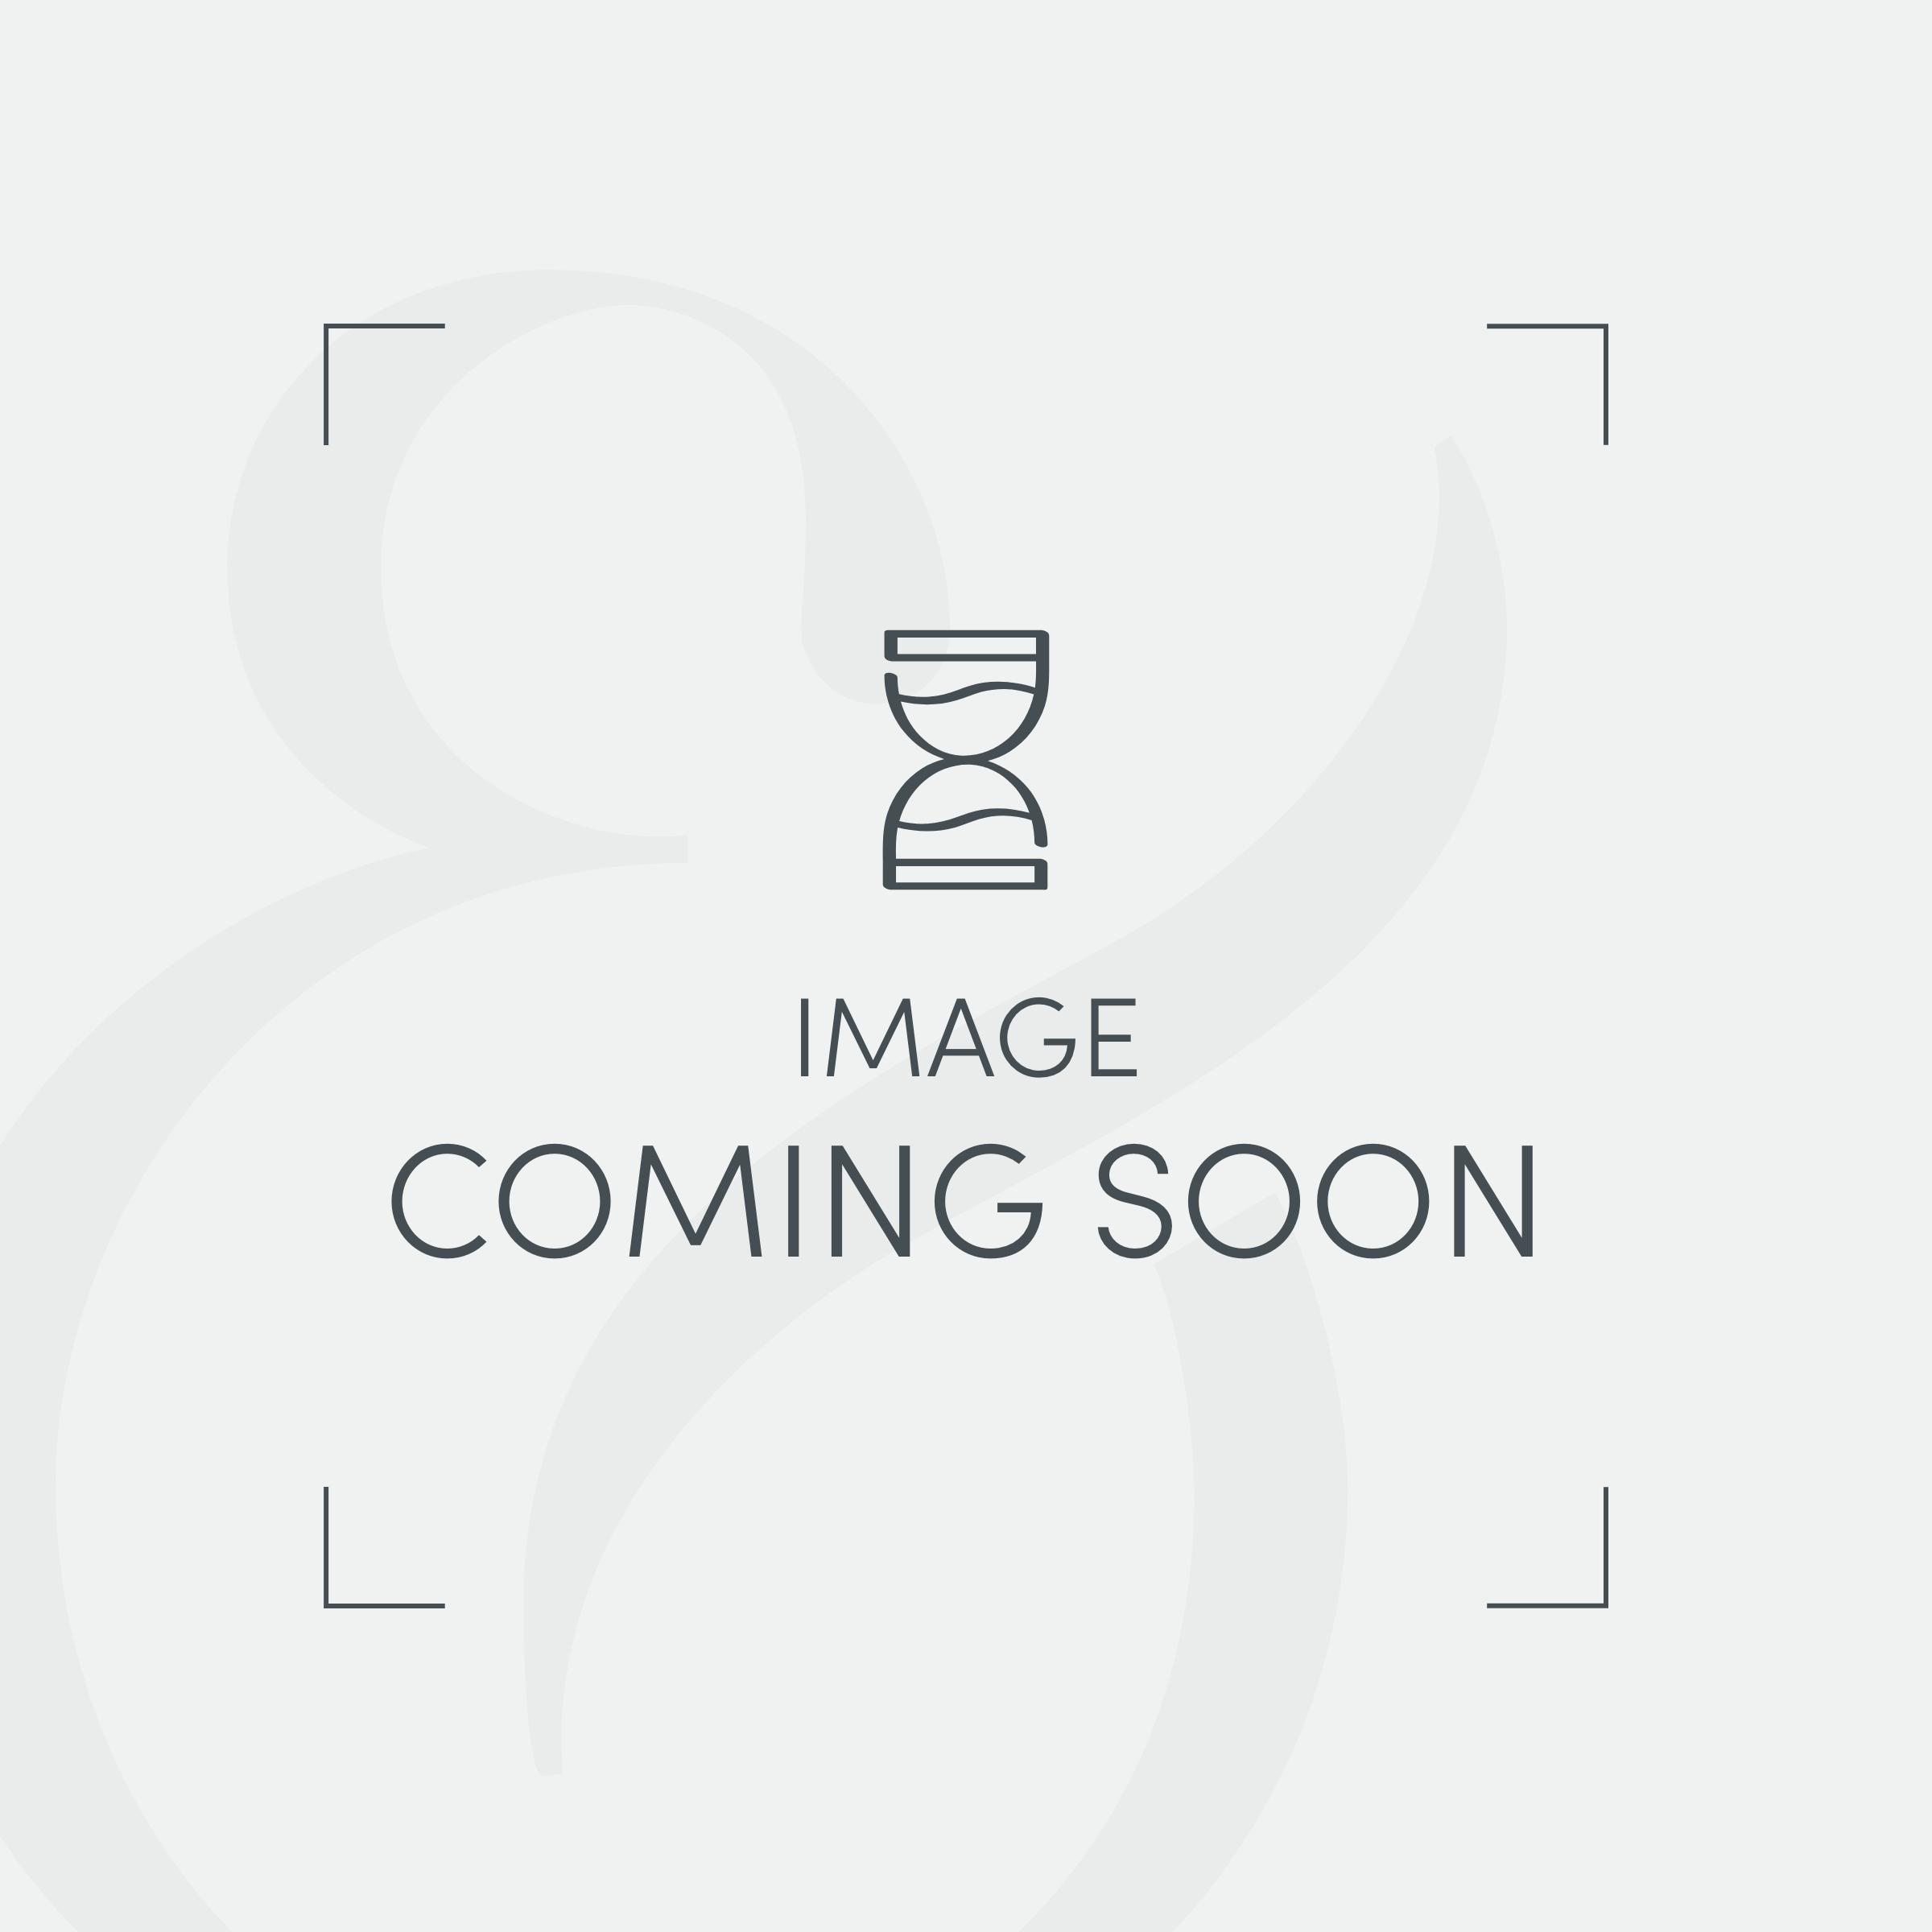 White 200 Thread Count Egyptian Cotton Single Duvet Cover